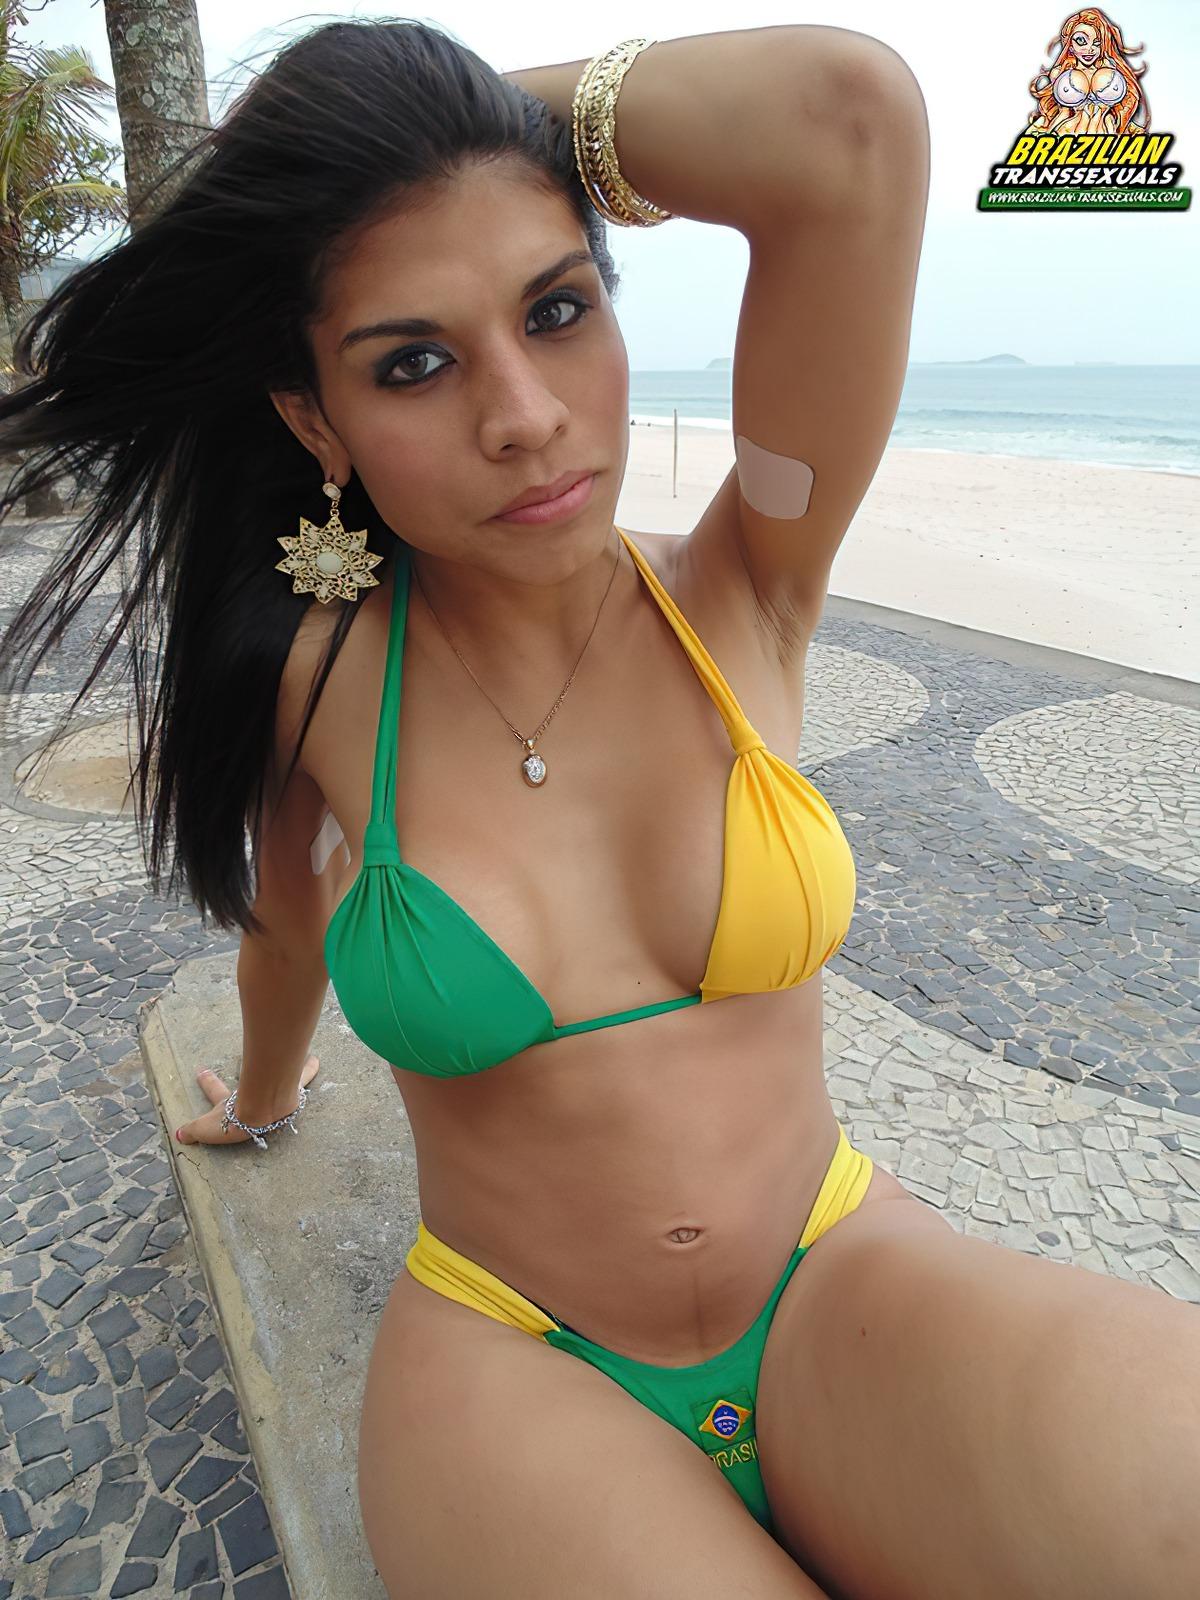 Morena Brasileira Travesti (1)